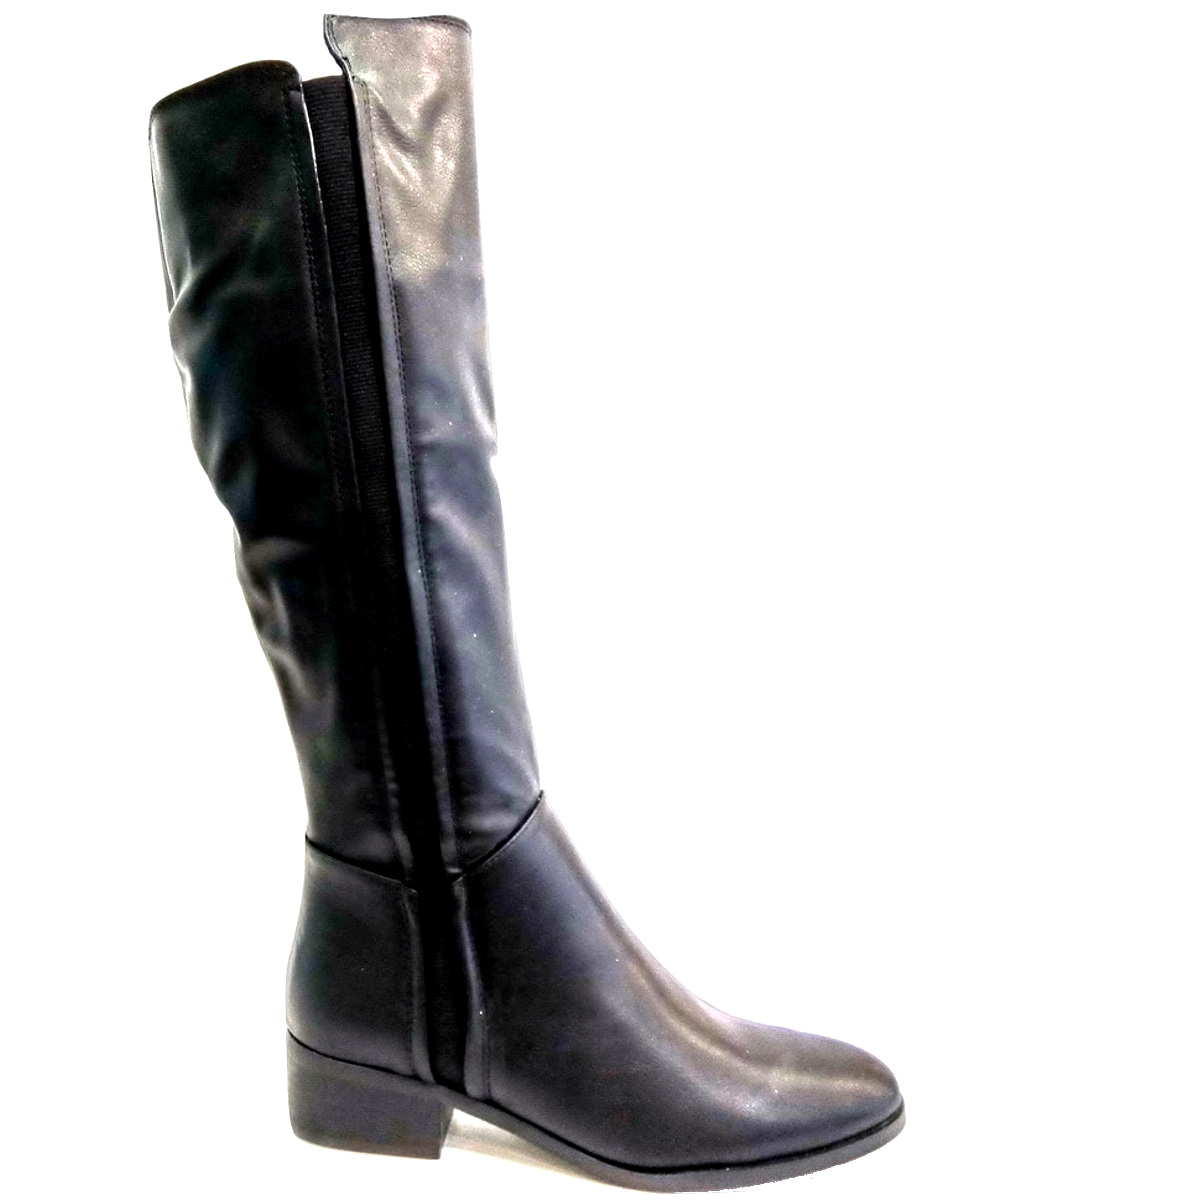 aa88dc12a77 Μπότες Adams Shoes 822-6514 ΜΑΥΡΟ